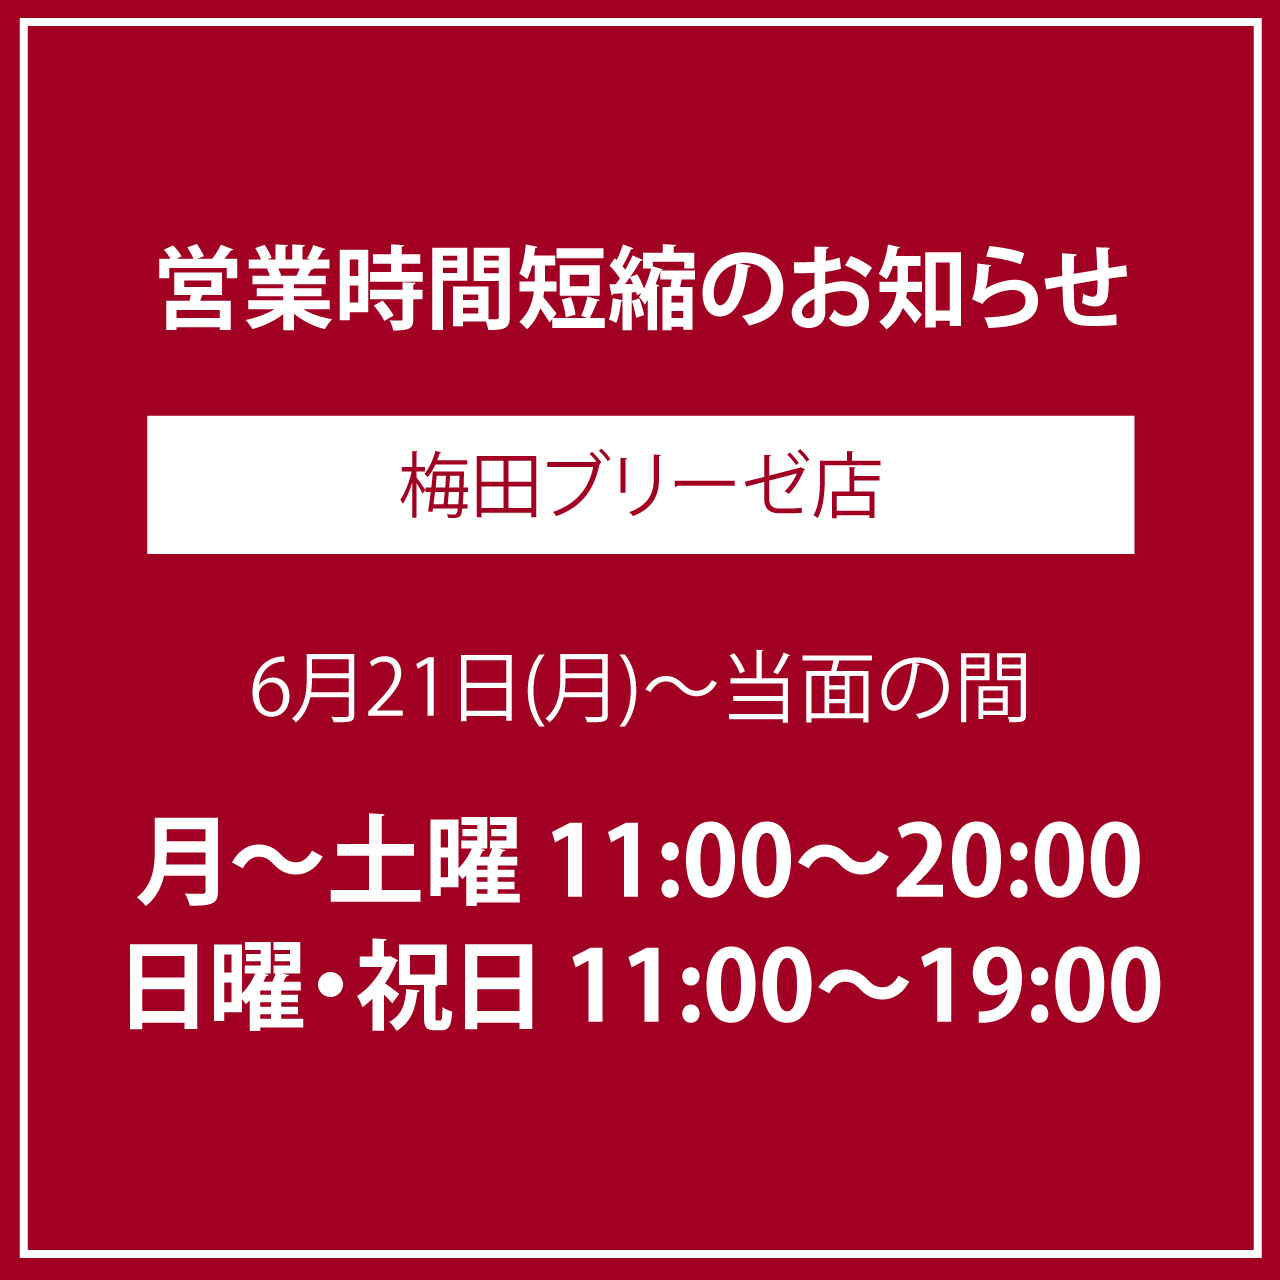 20210621 time title breeze - 【梅田ブリーゼ店・NU茶屋町店】短時間営業にて土日の営業を再開いたします